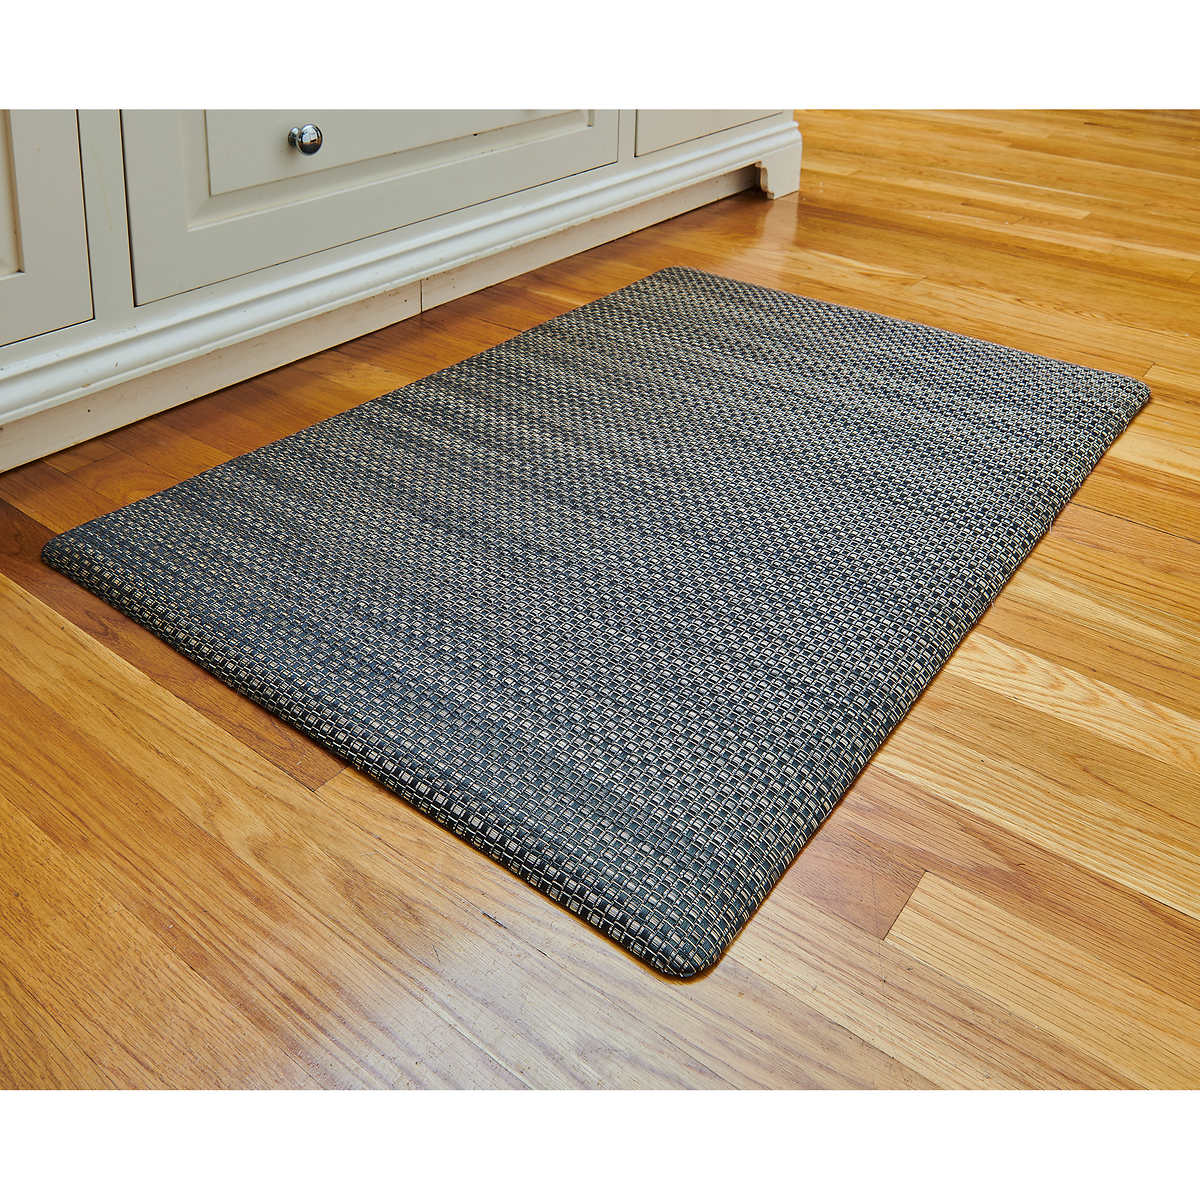 Luxe Therapeutic Floor Mats